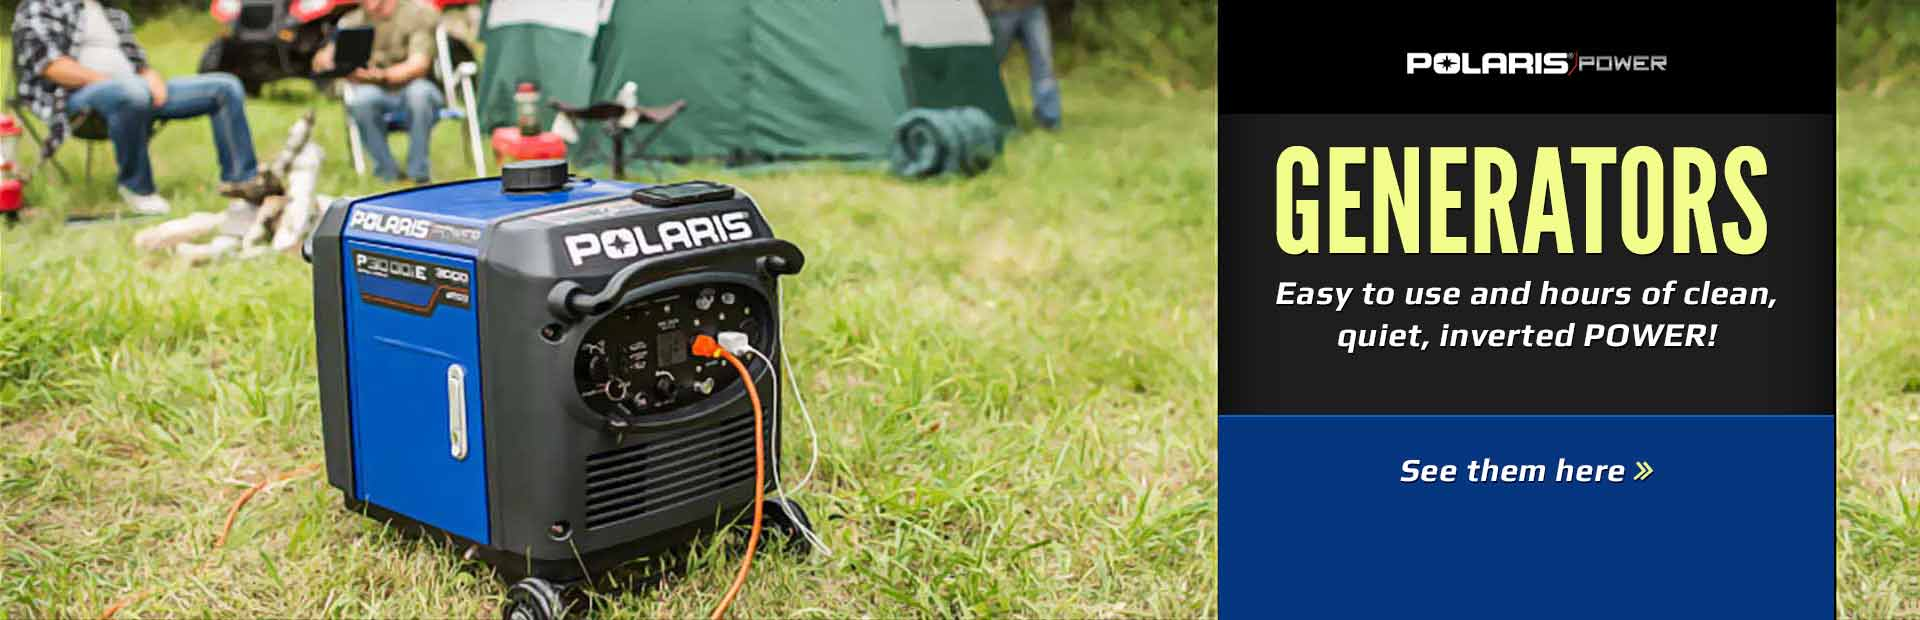 Polaris Generators: Click here to view the models.